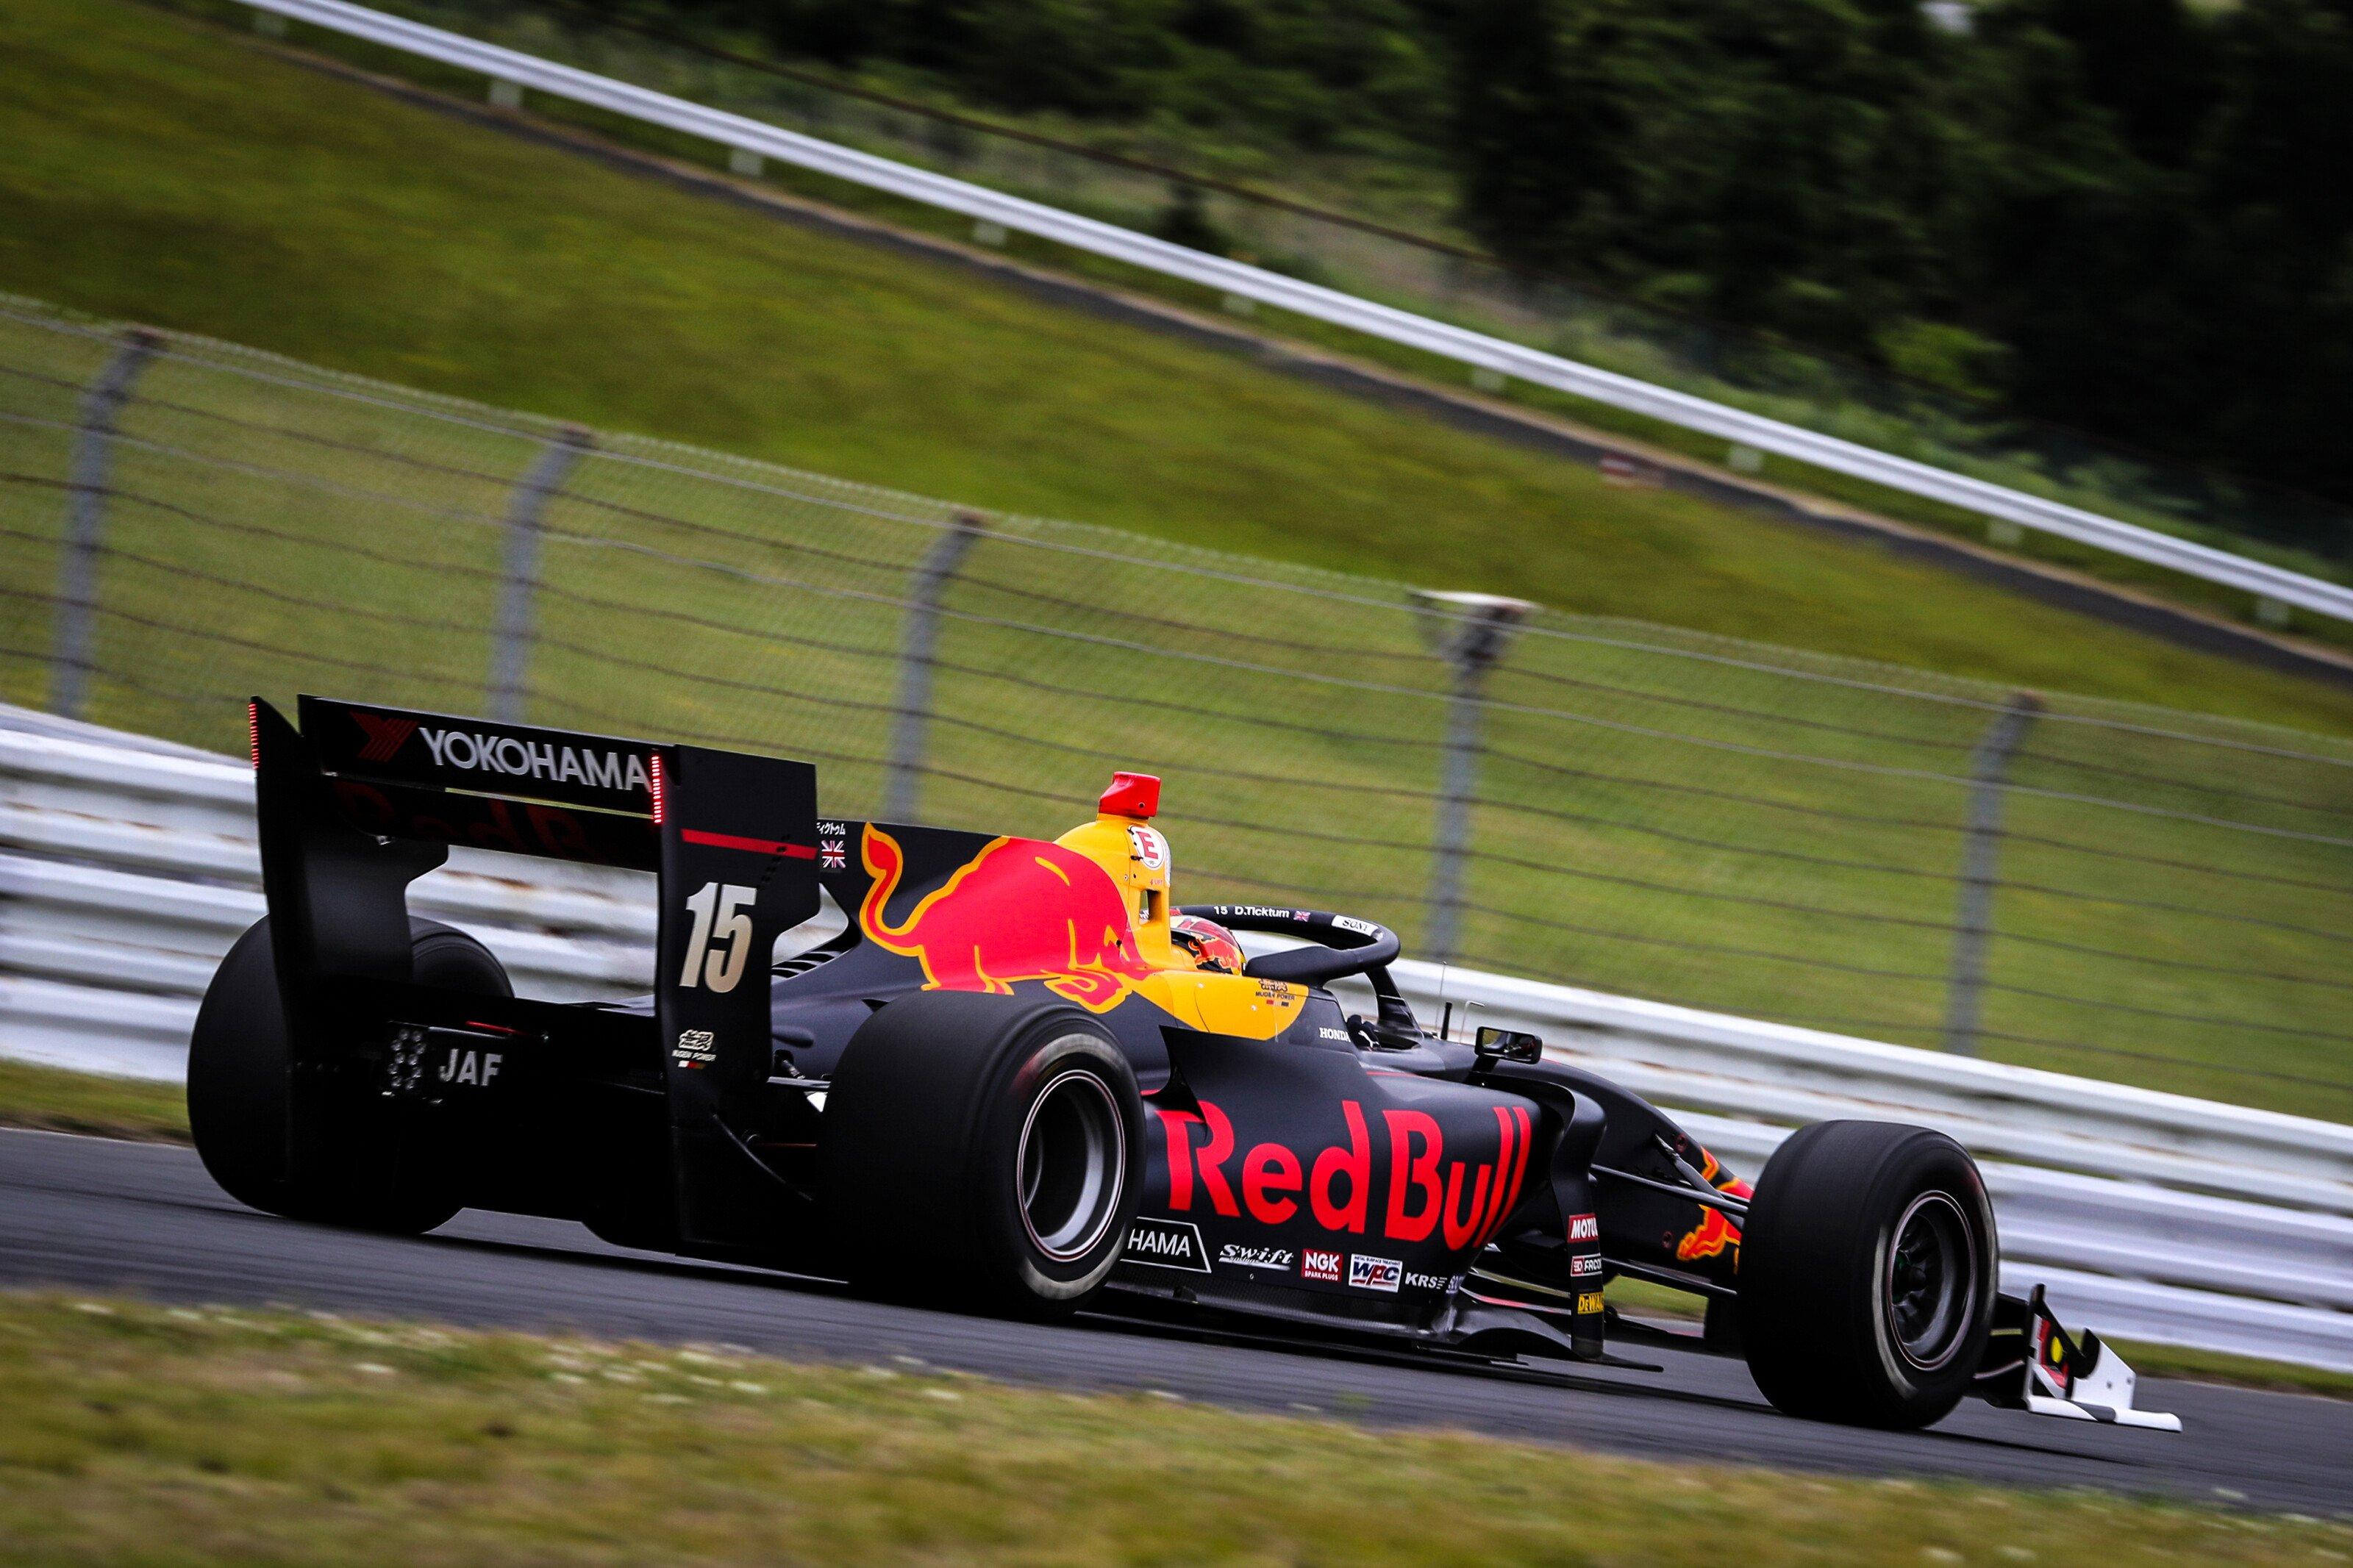 Lineup DAMS 2020 Dan Ticktum Super Formula 2019